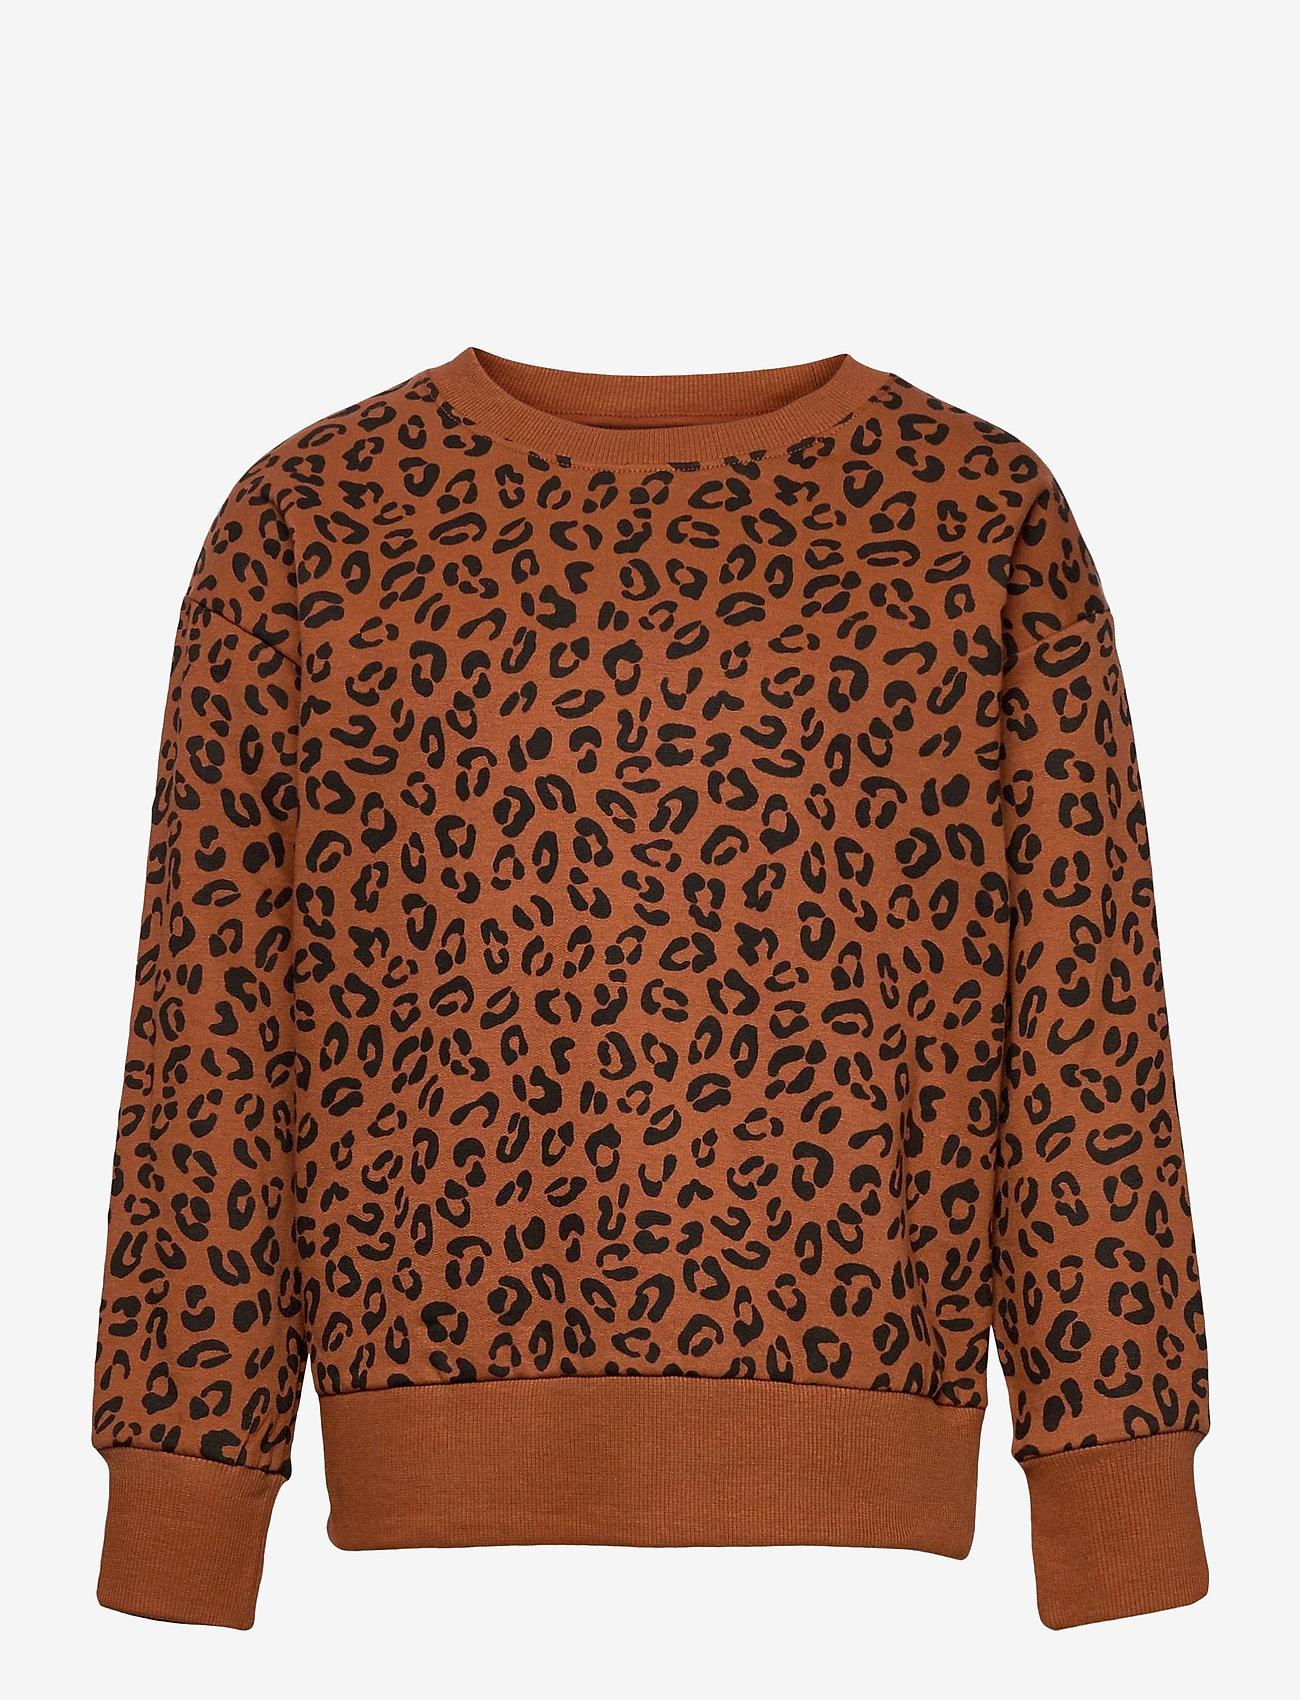 Lindex - Sweater Leo AOP street online - sweatshirts - brown - 0